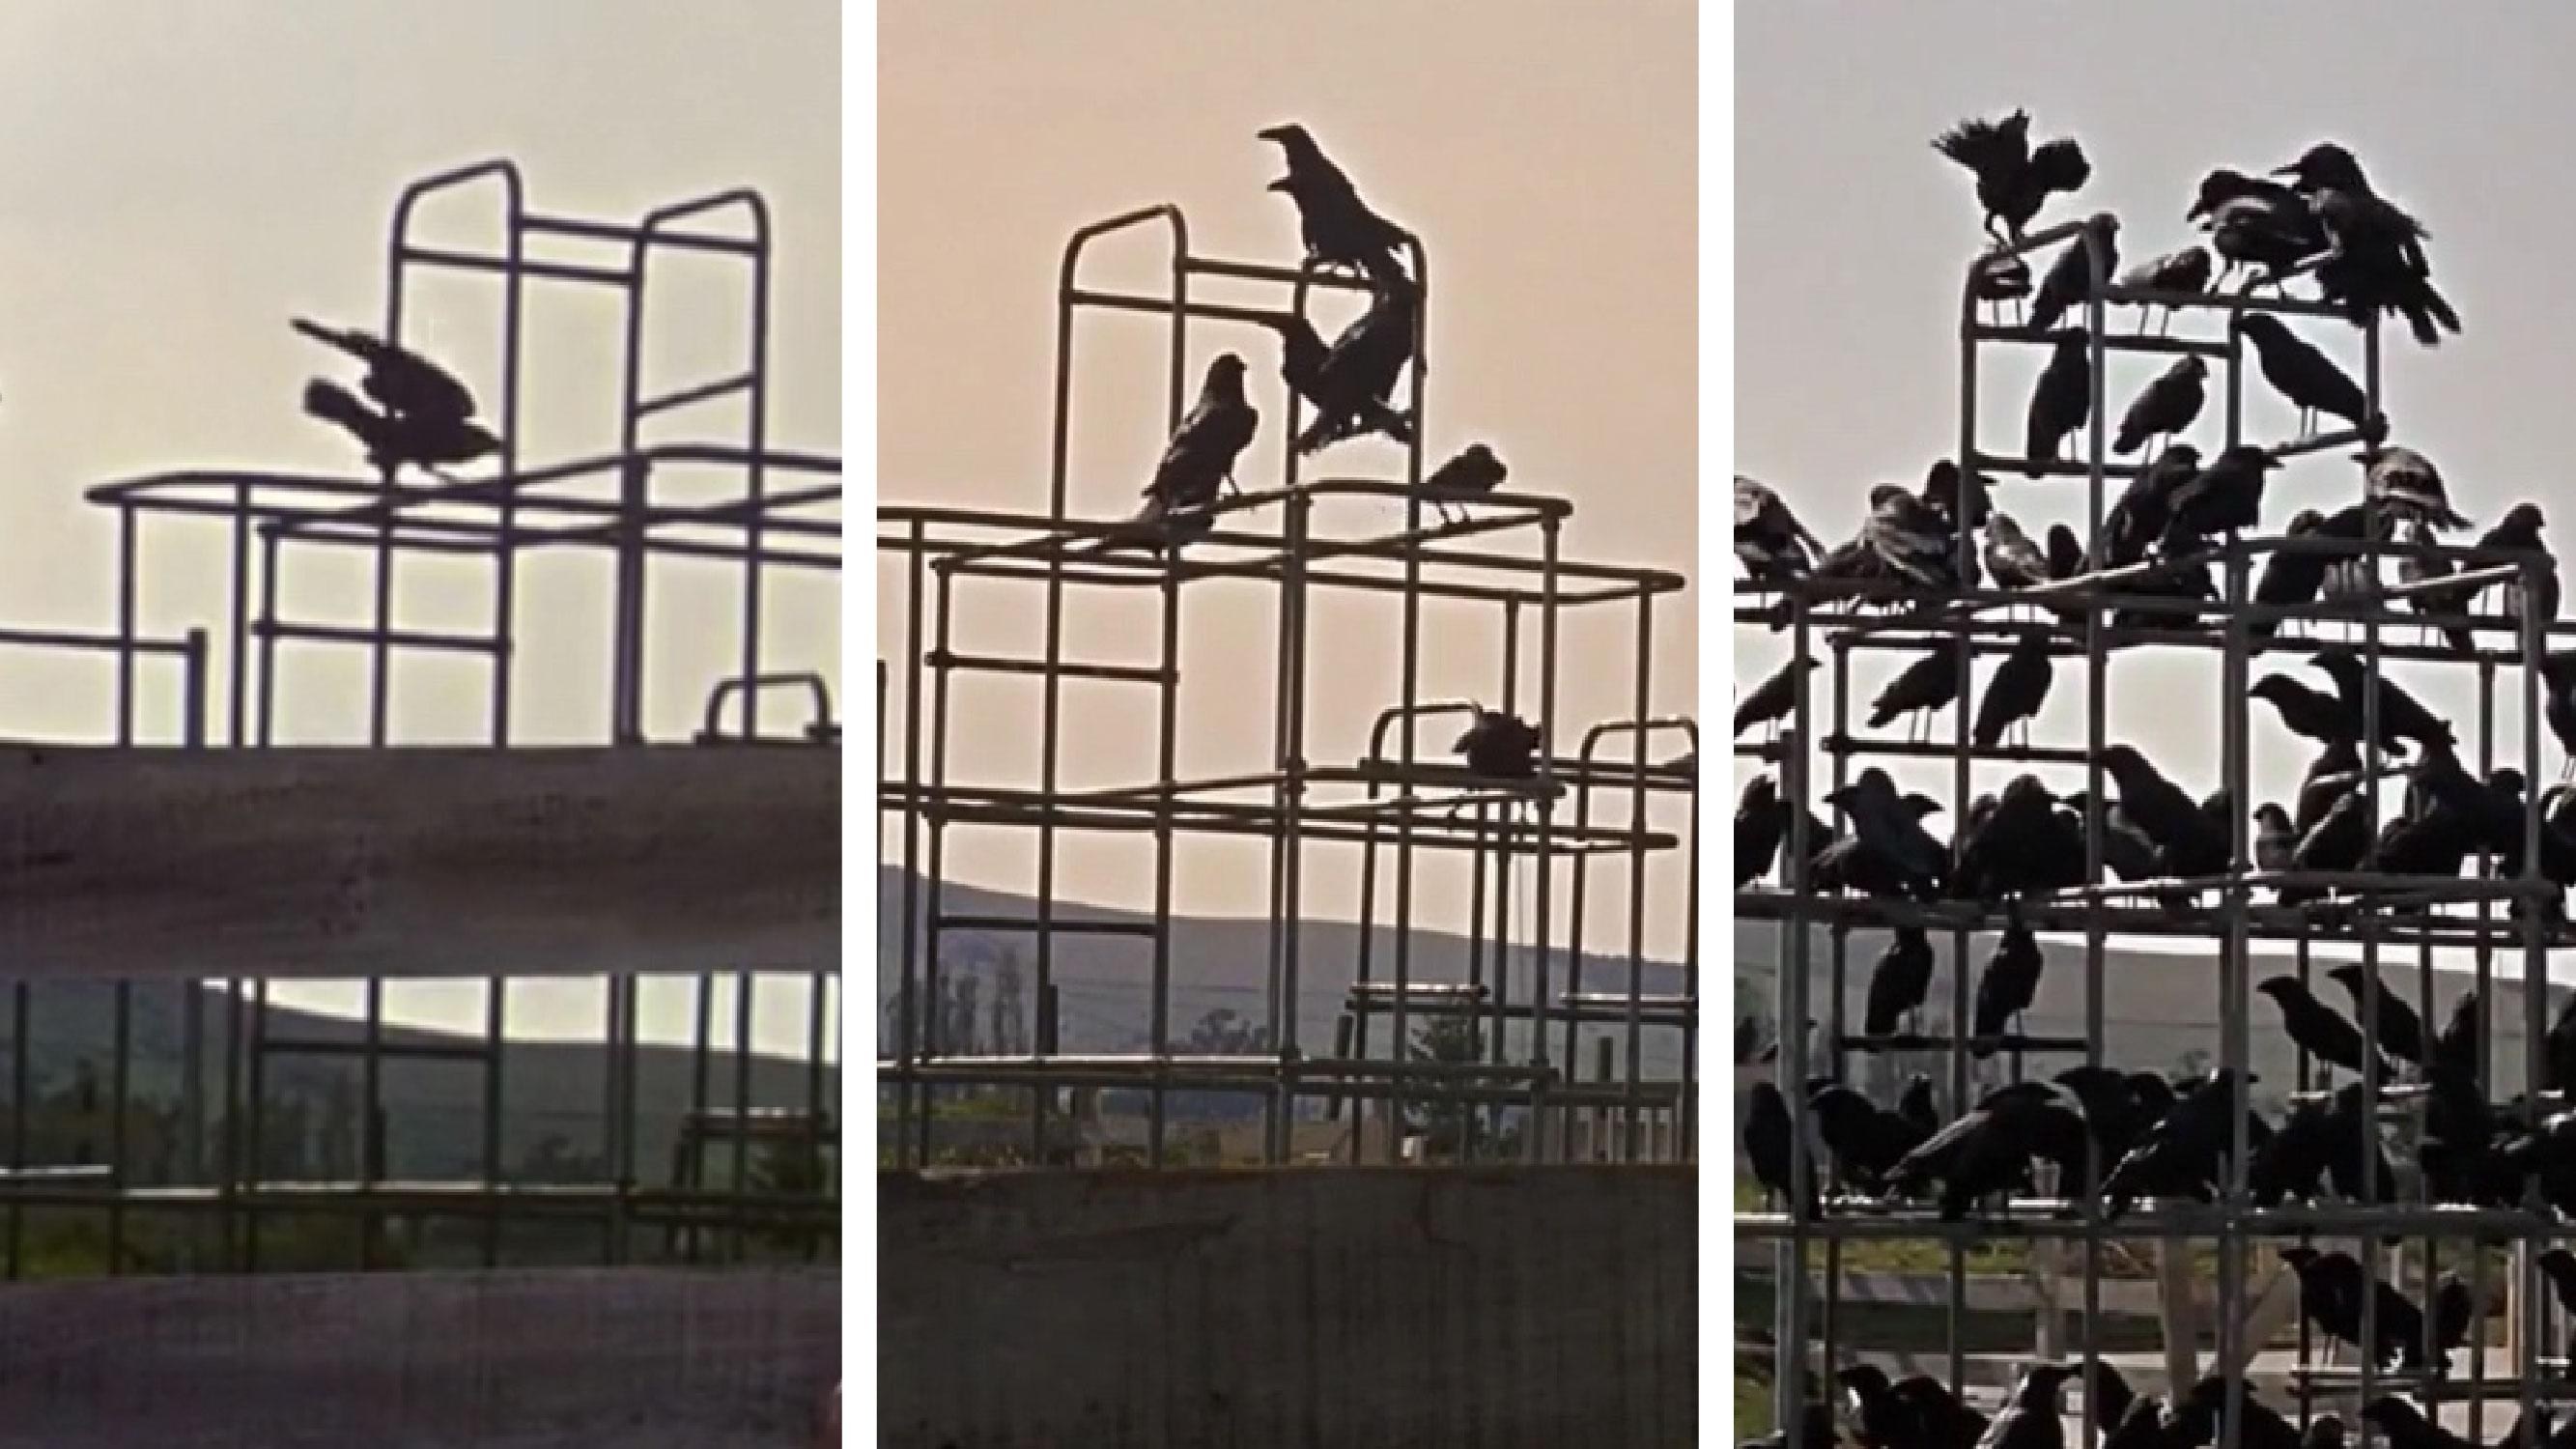 Умножение объектов (птиц) в преддверии нападения птиц на учеников школы